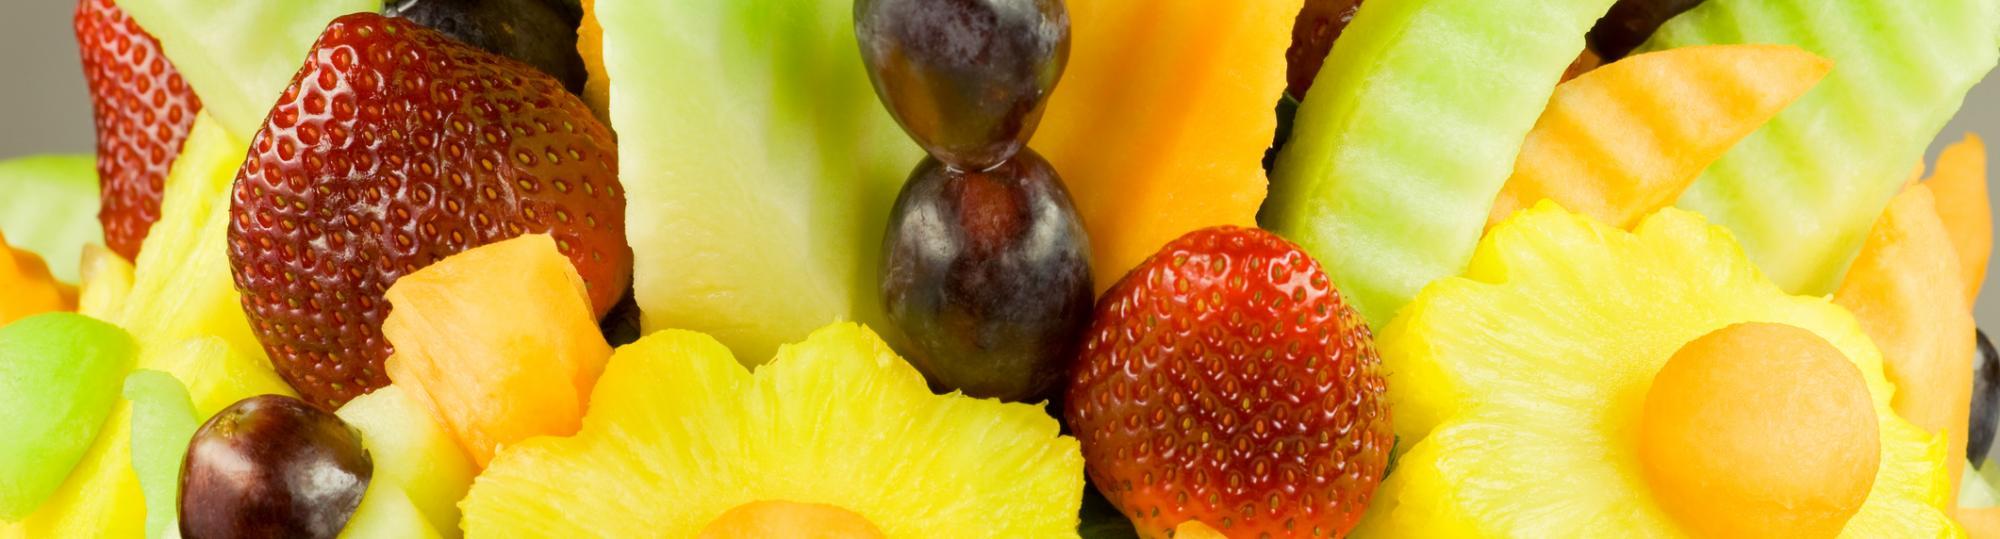 FruitBouquets.com Military Discount with Veterans Advantage